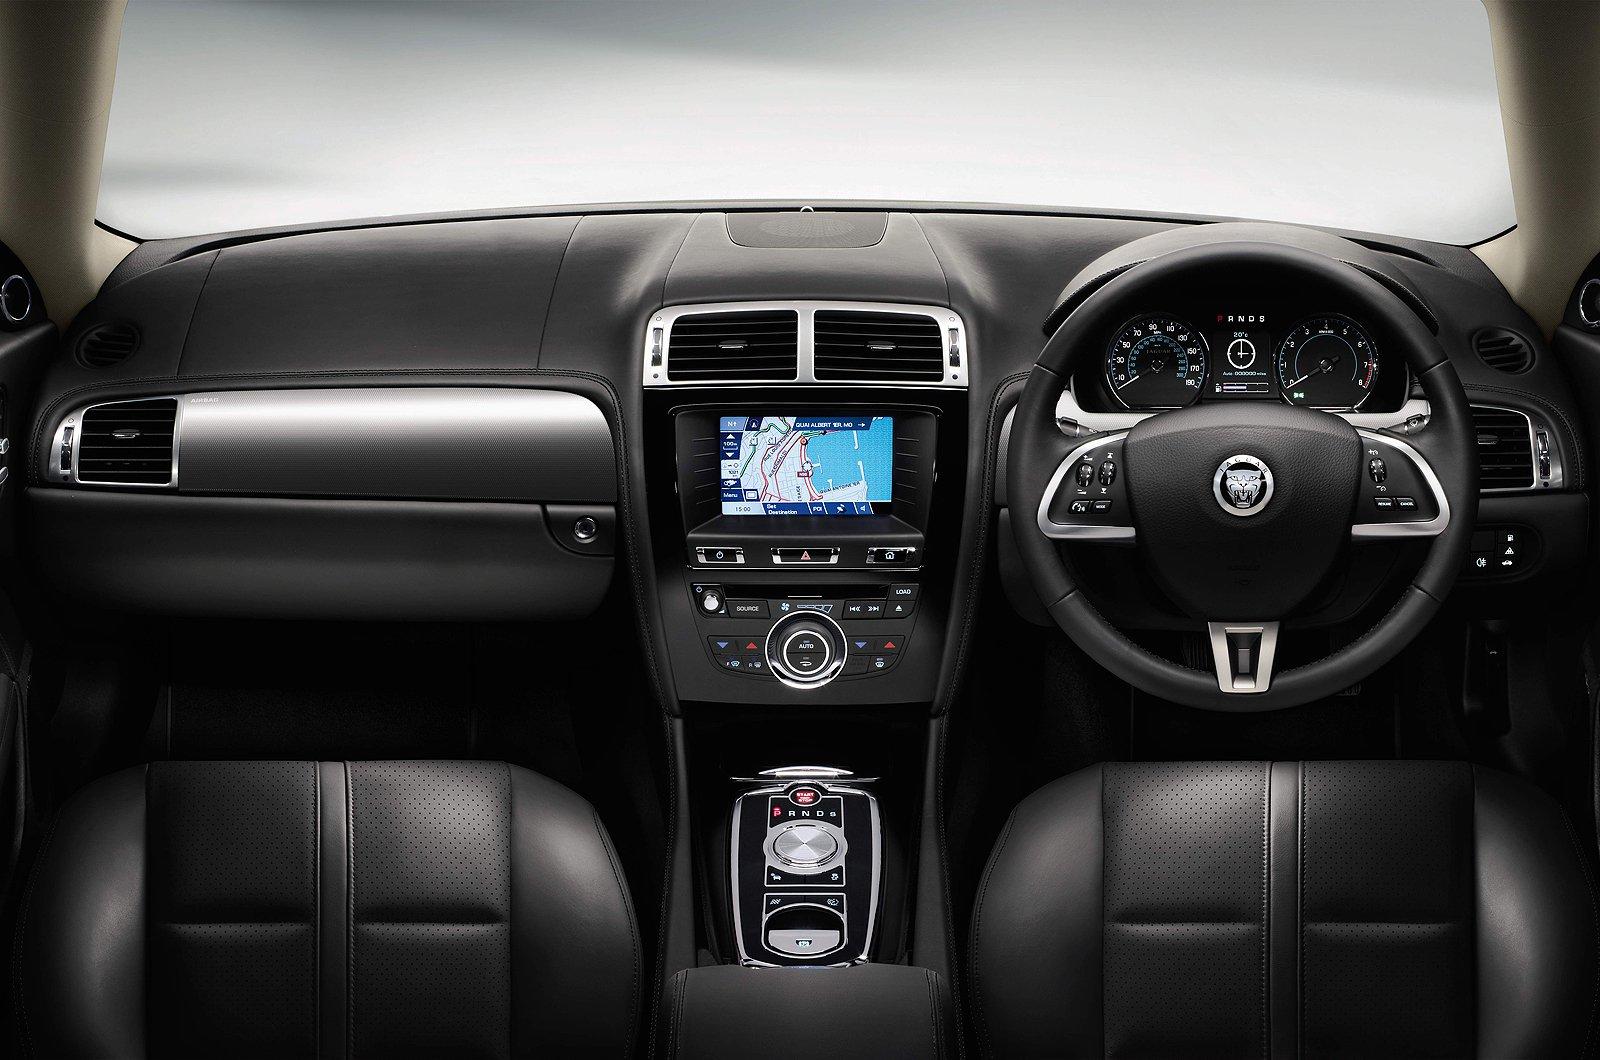 Jaguar XKR 5.0 Convertible - interior